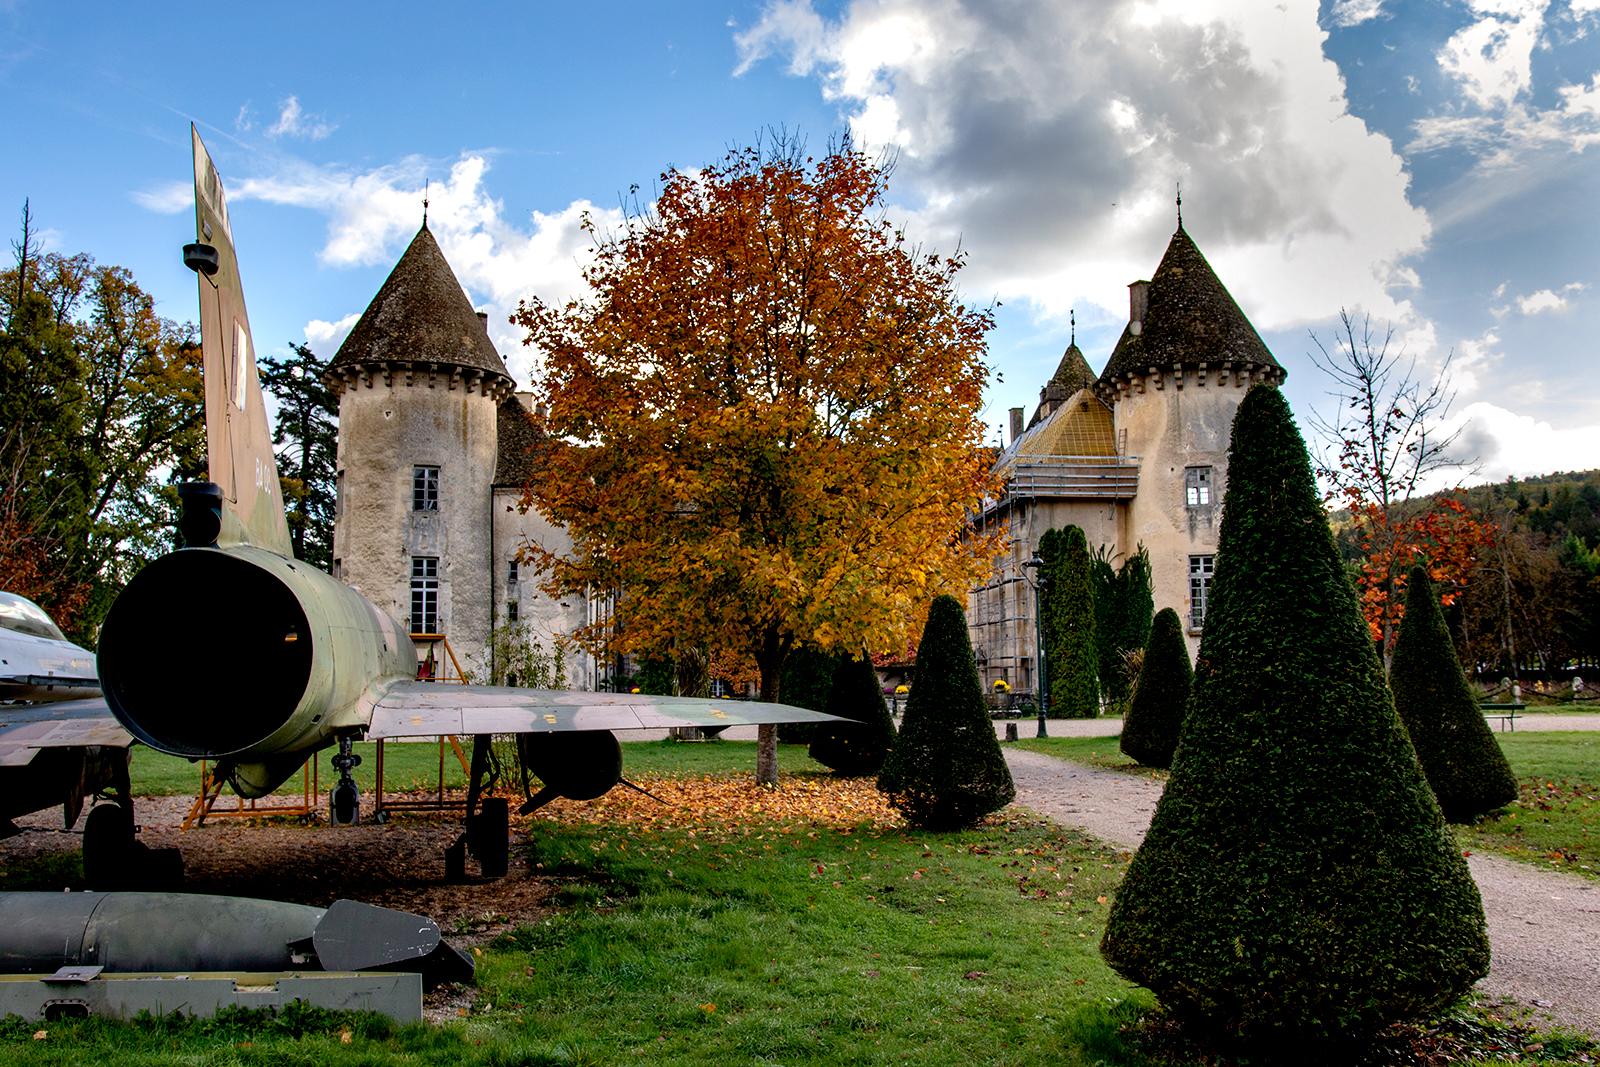 Chateau de Savigny - Fighter Jet Collection, France